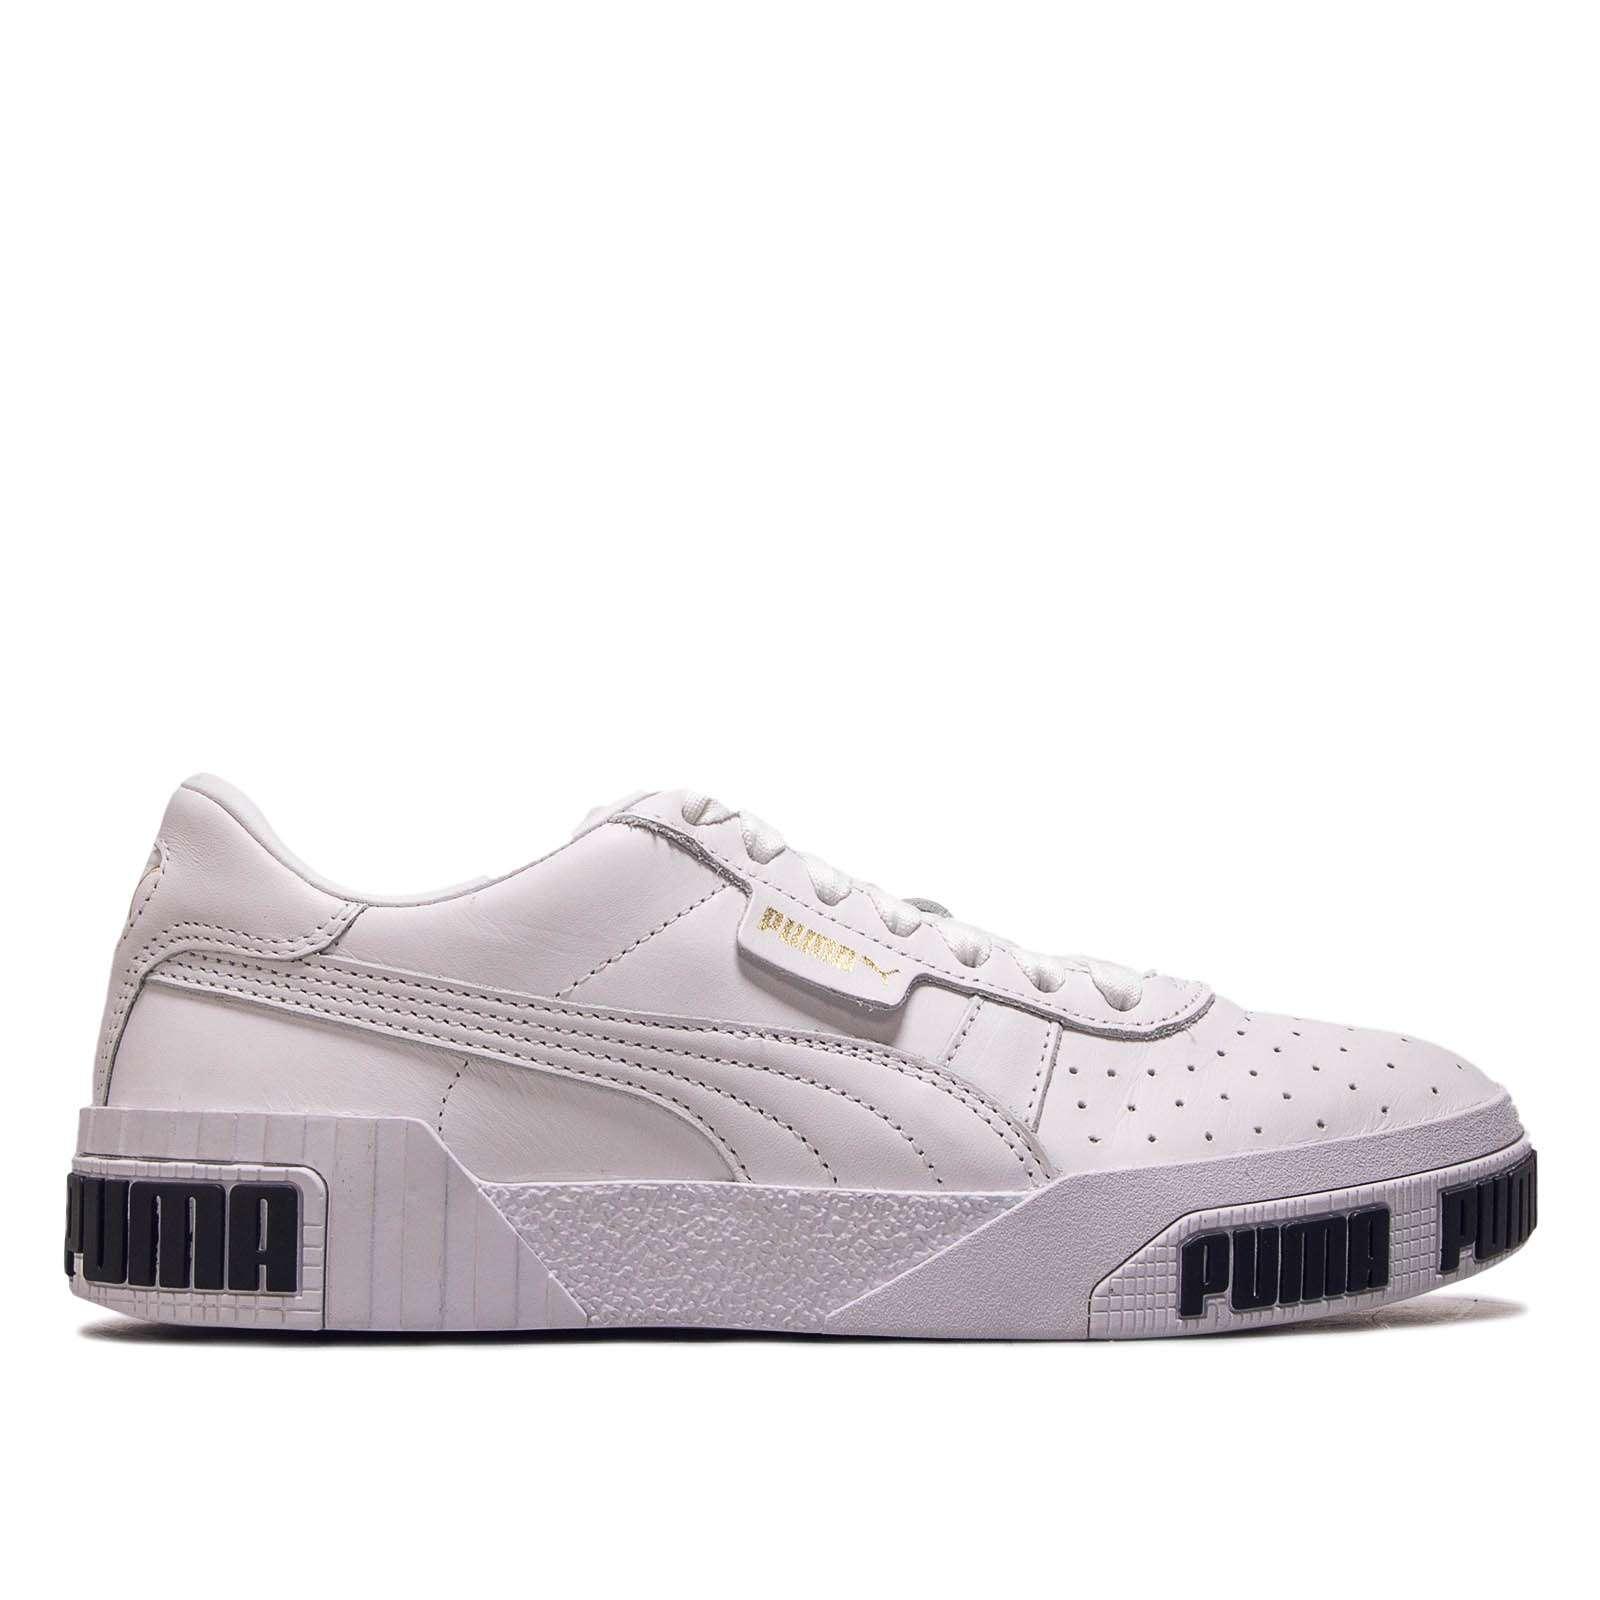 Damen Sneaker Cali Bold White Metallic Gold